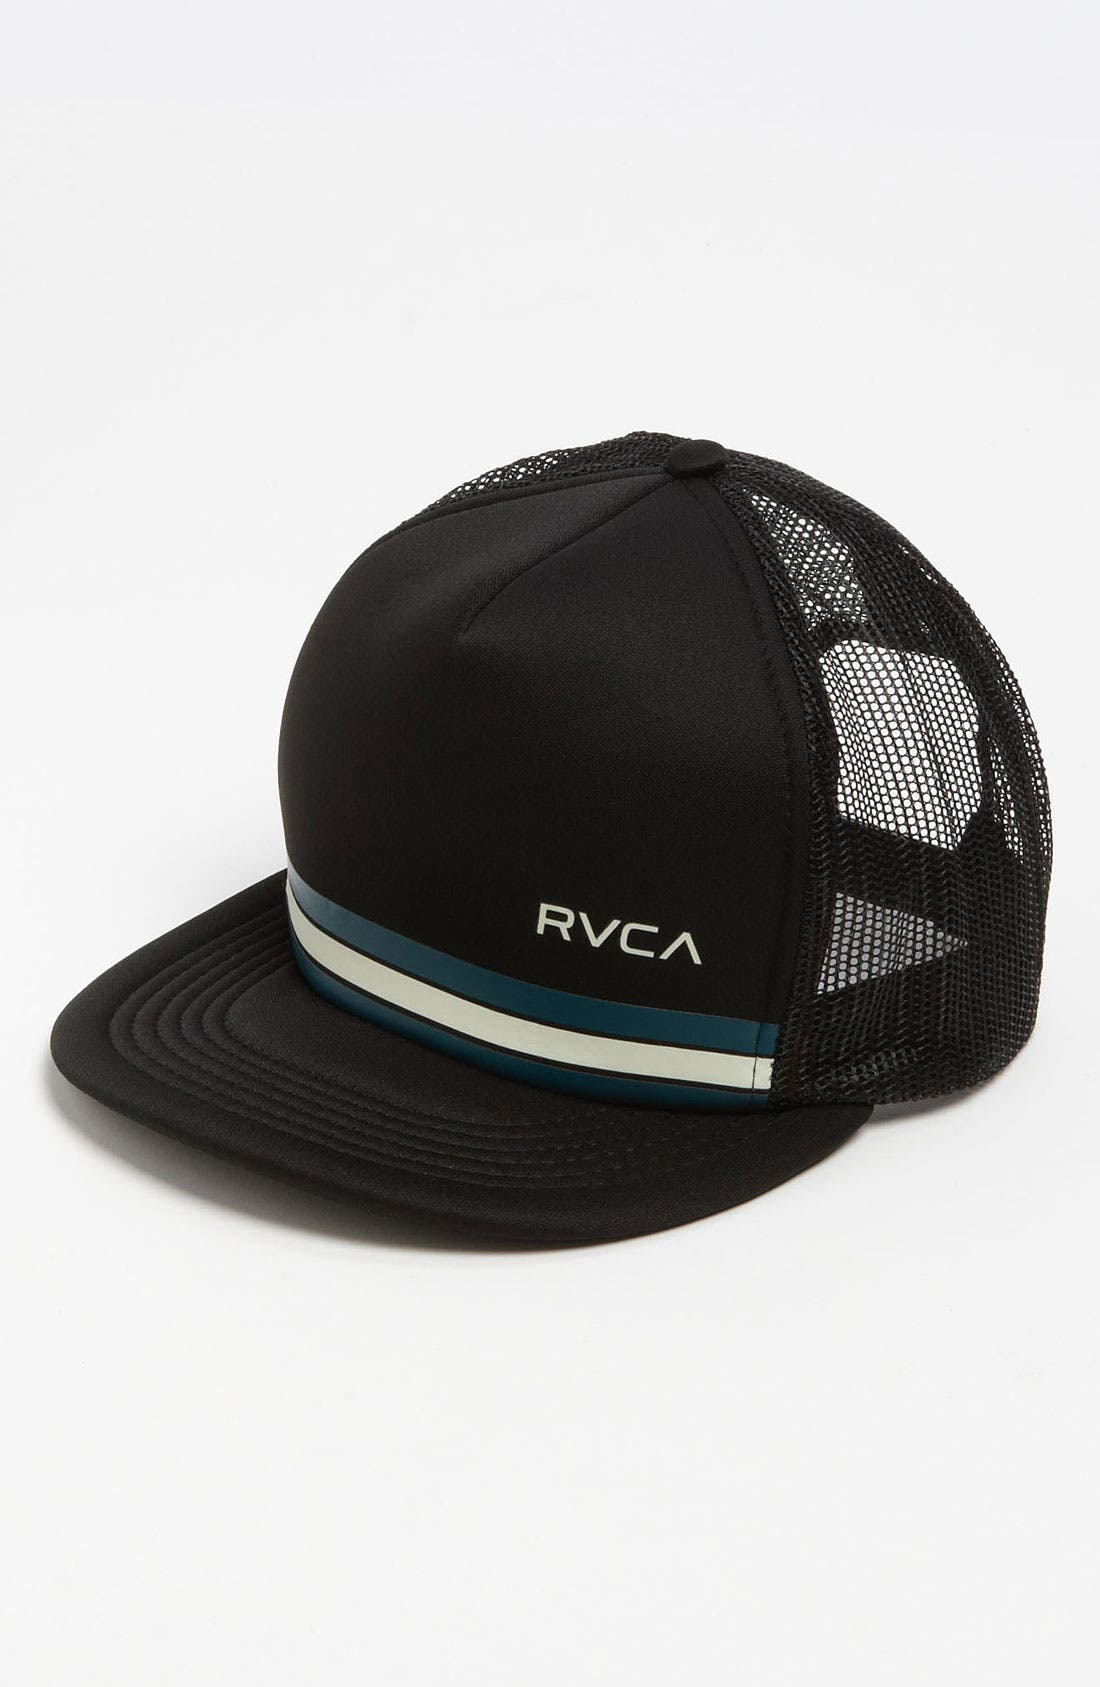 Main Image - RVCA 'Barlow' Trucker Hat